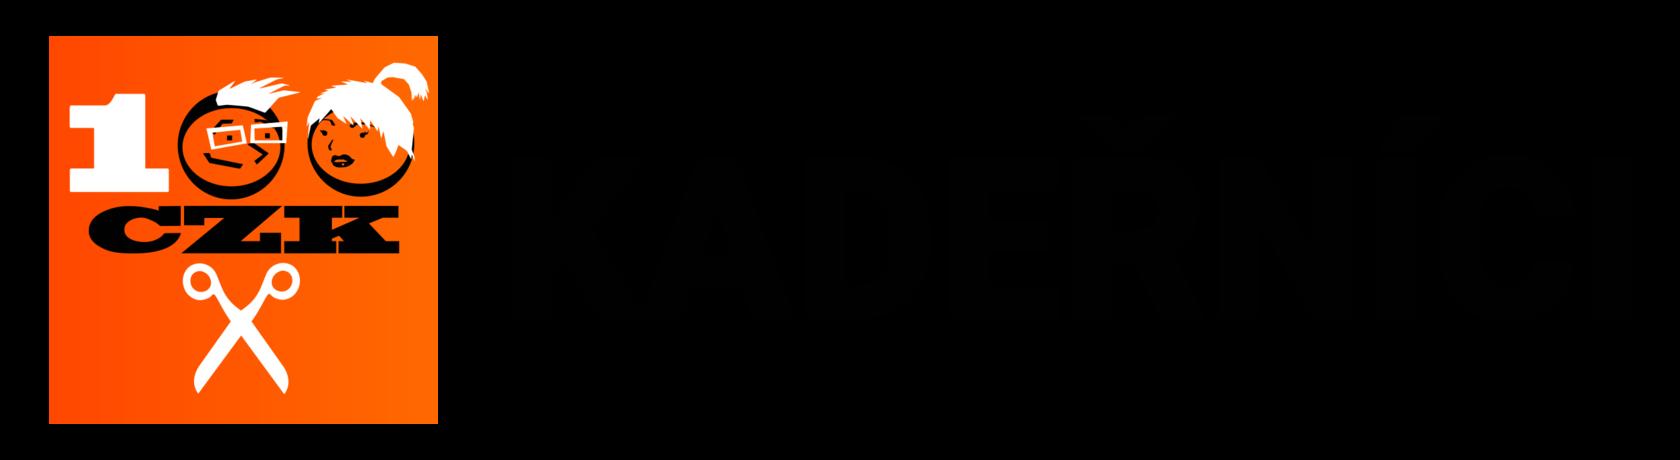 kadeřnictví №1 #1 kadernictvi работа парикмахером в чехии kadeřník kadeřnice práce kadeřníkem no1 n1 N1 No1